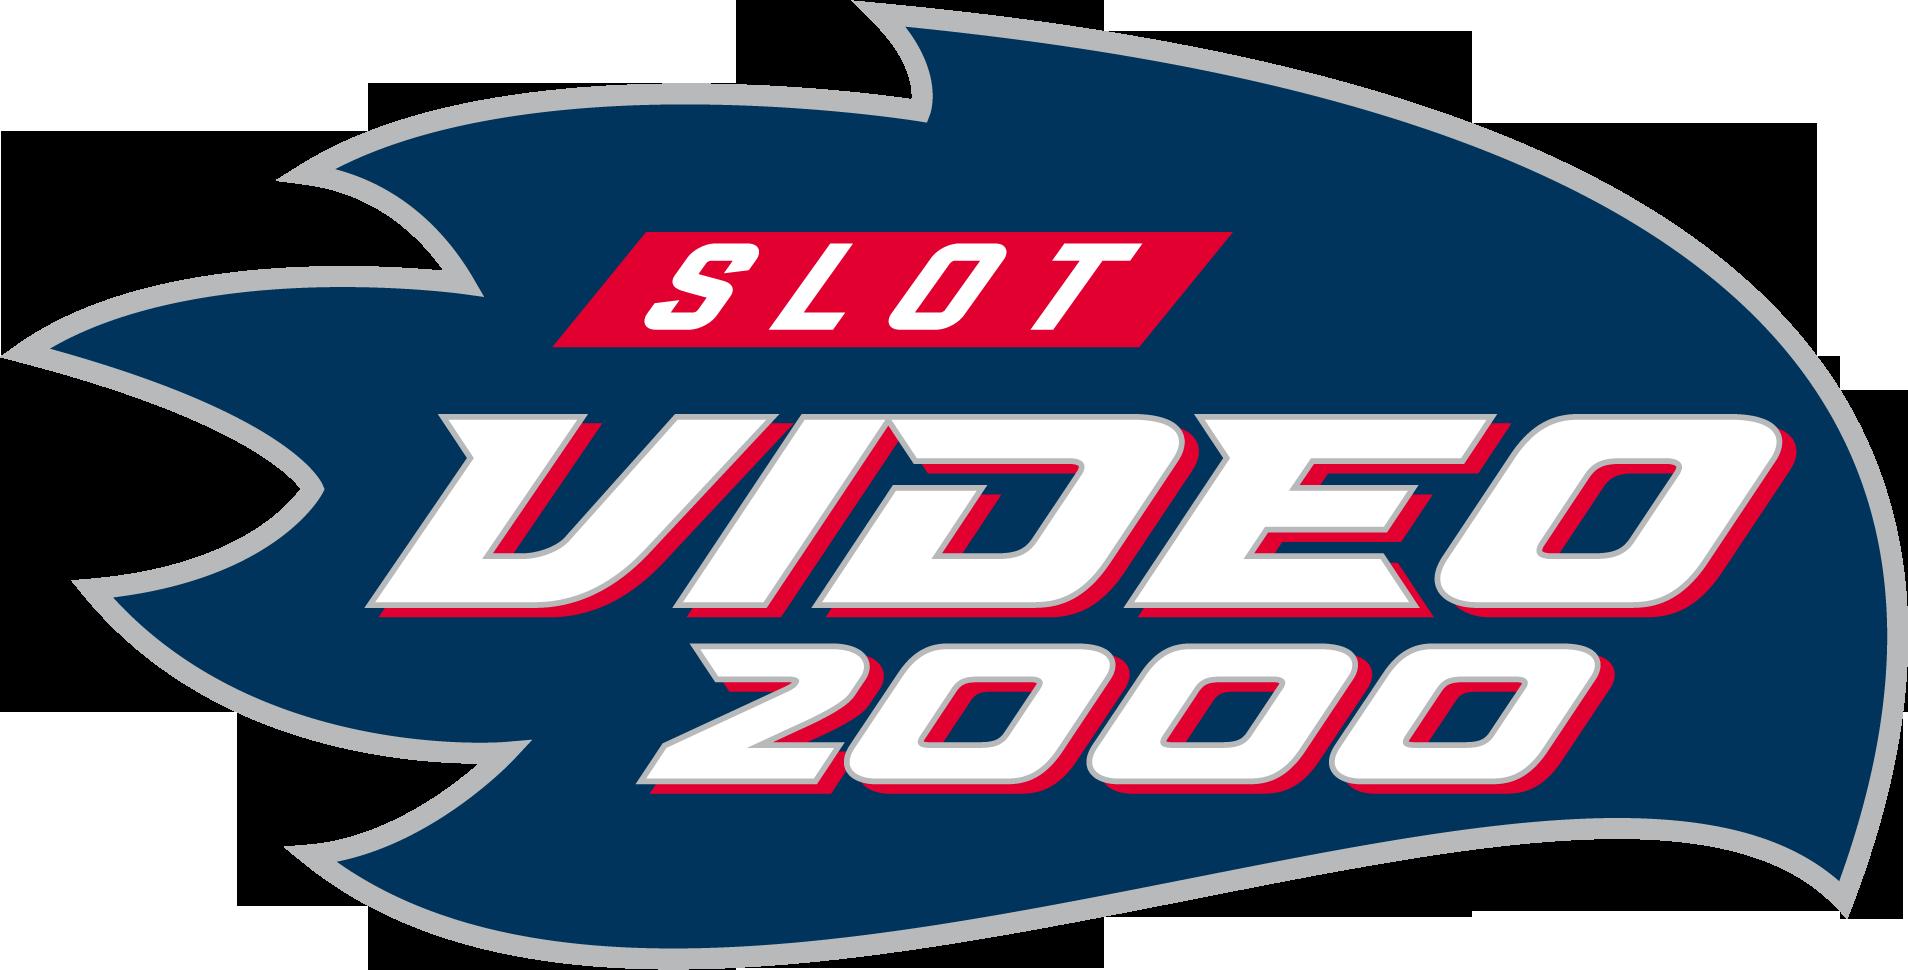 Logo Slot Video 2000